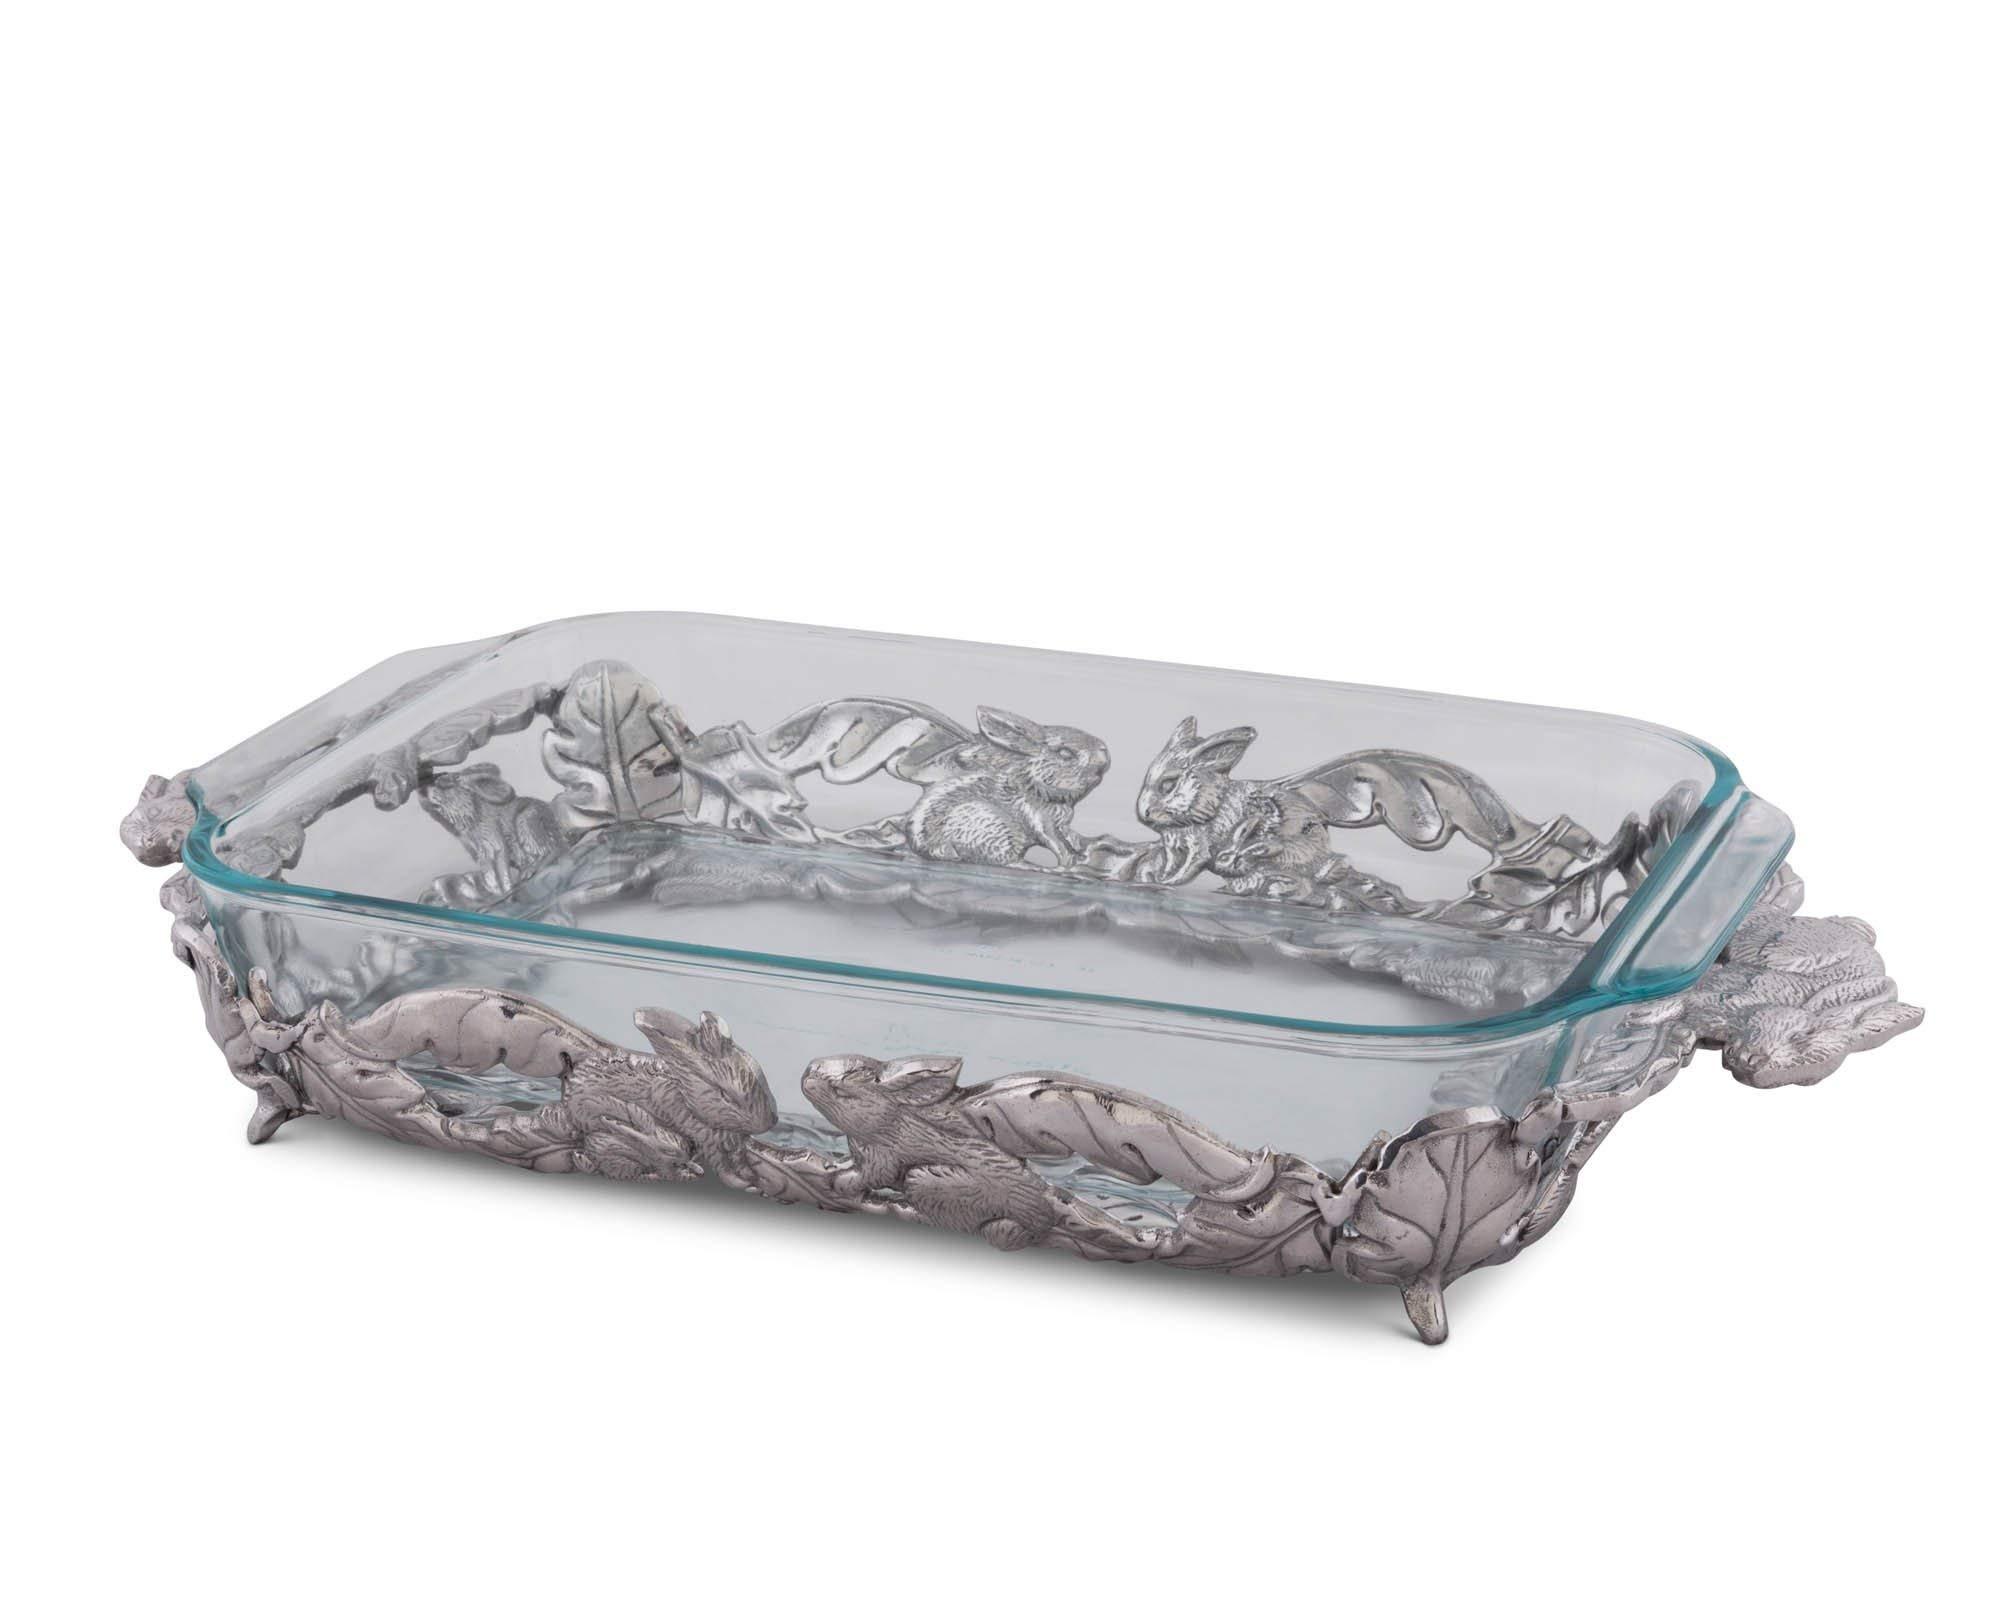 Arthur Court Designs Aluminum Bunny Pattern Pyrex Casserole Dish Holder 18'' 3 Quart Pyrex